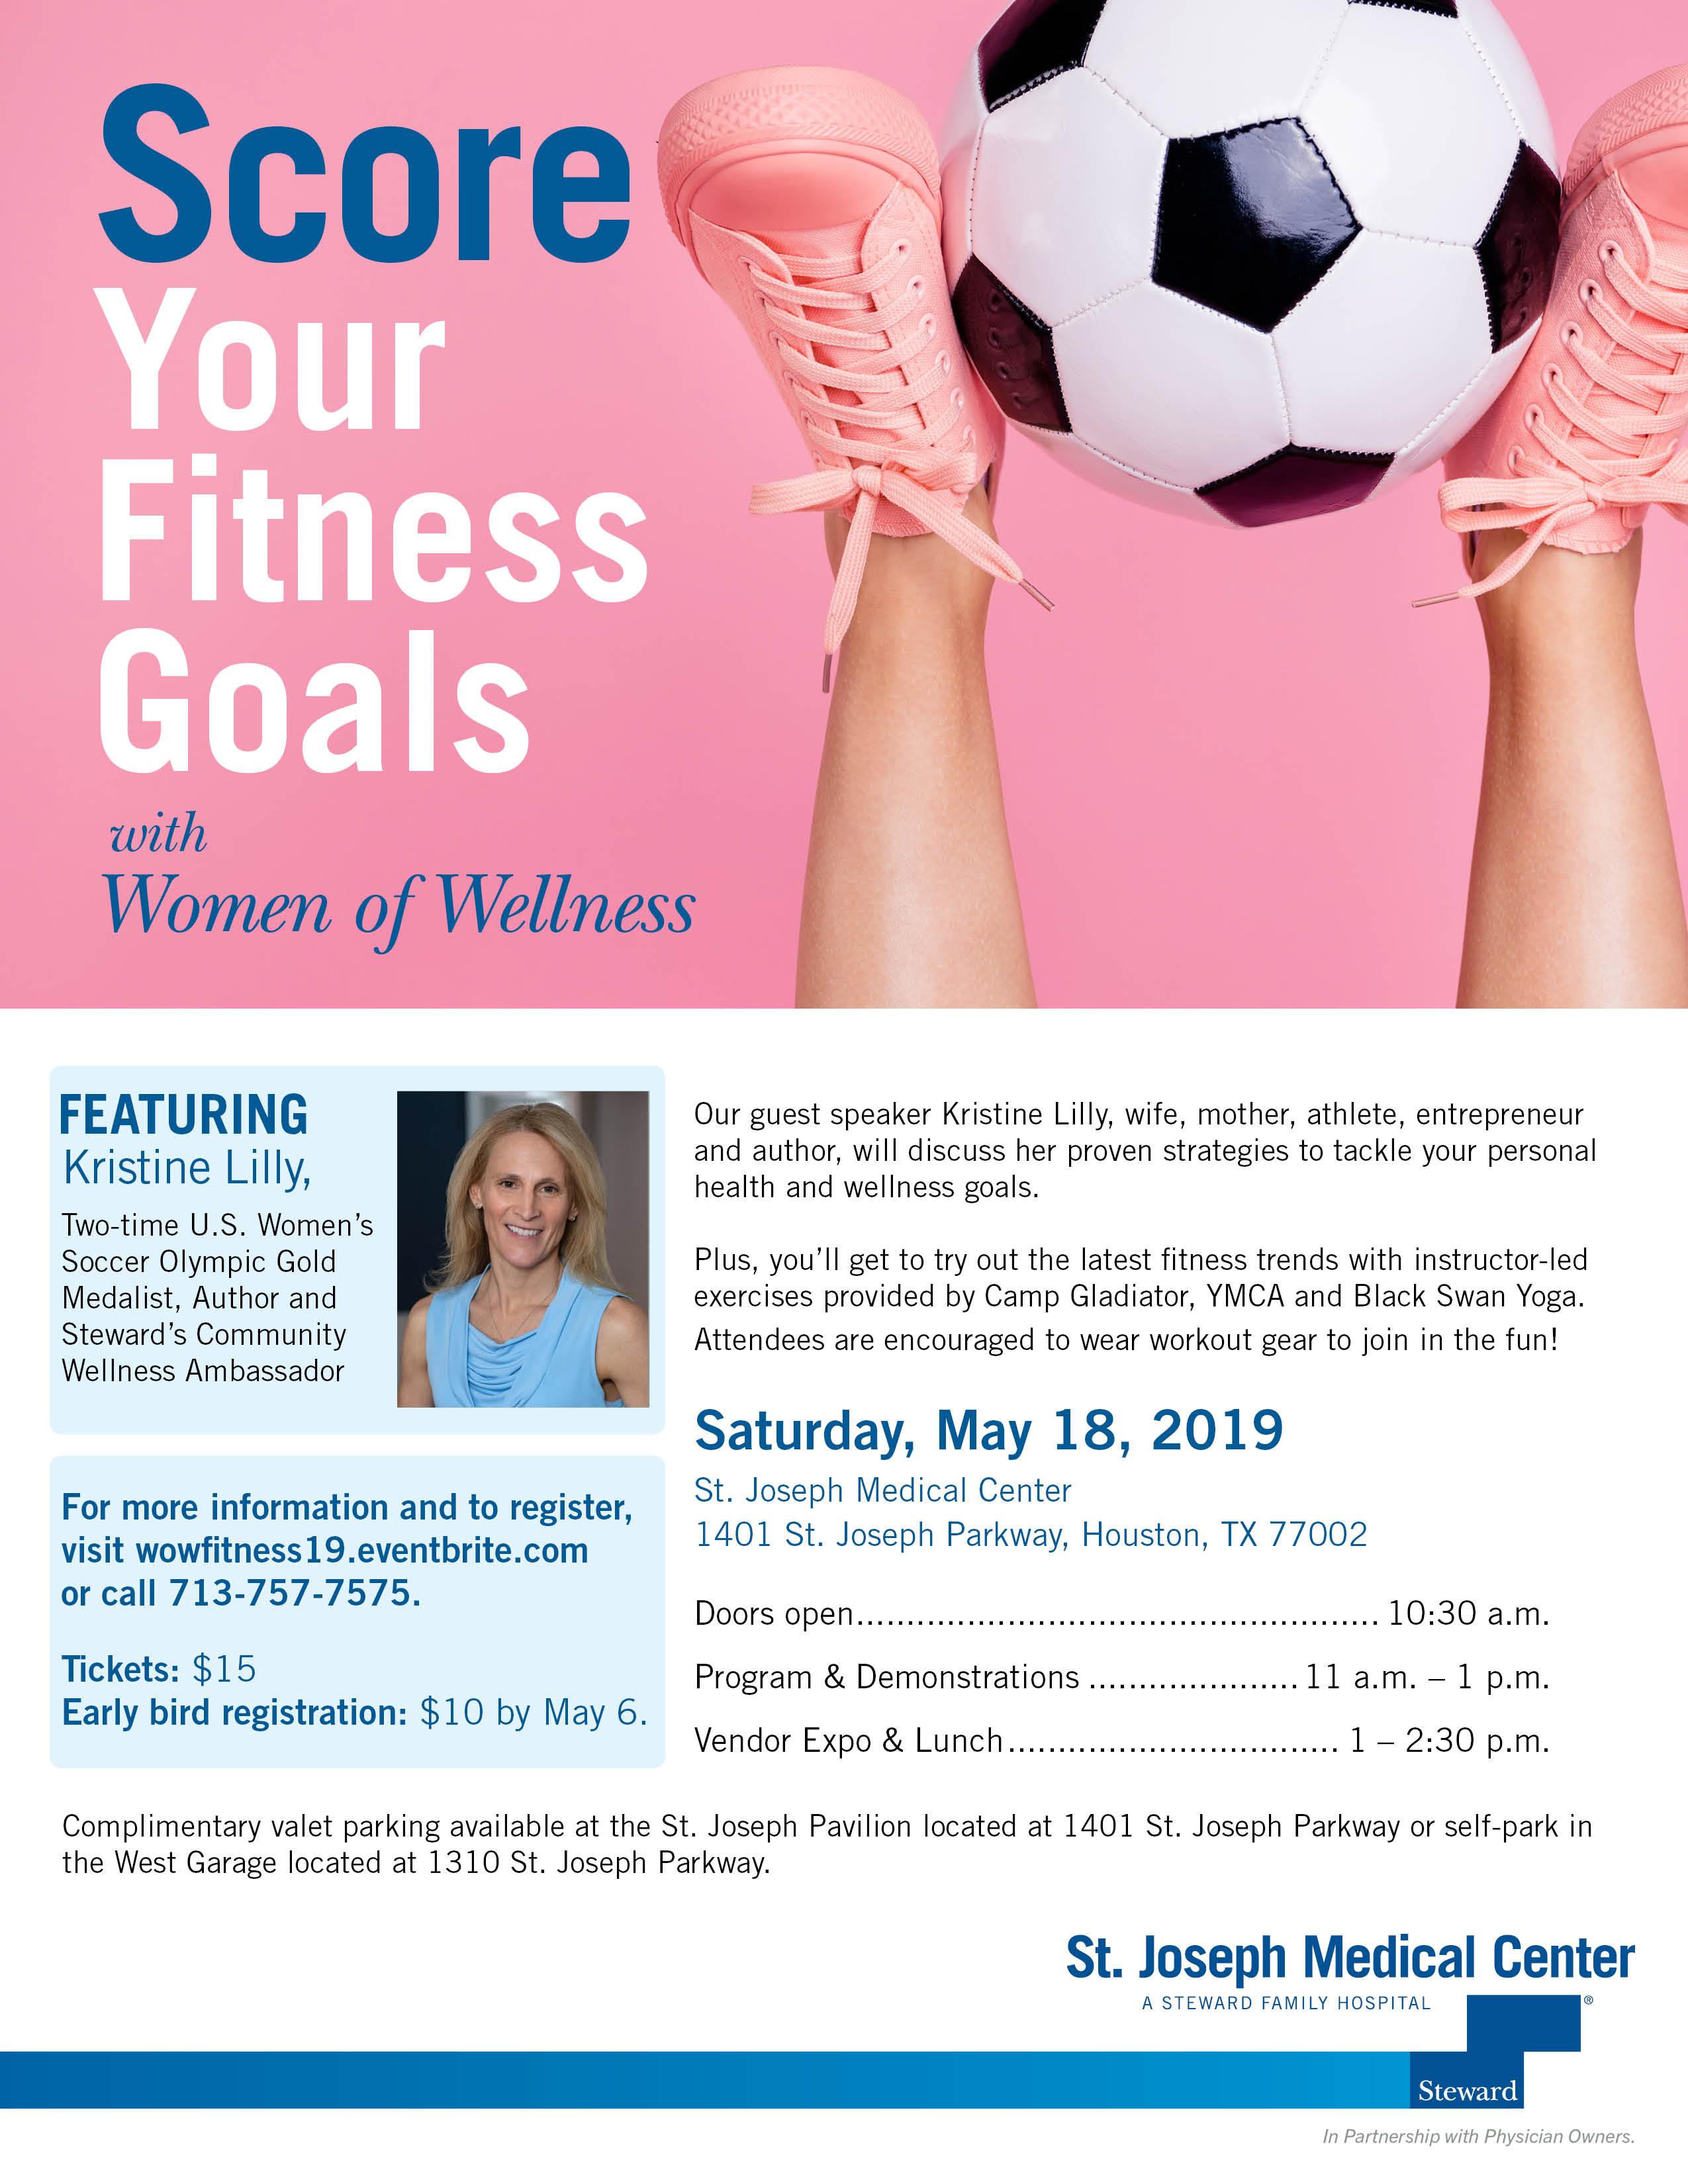 Score Your Fitness Goals Flyer